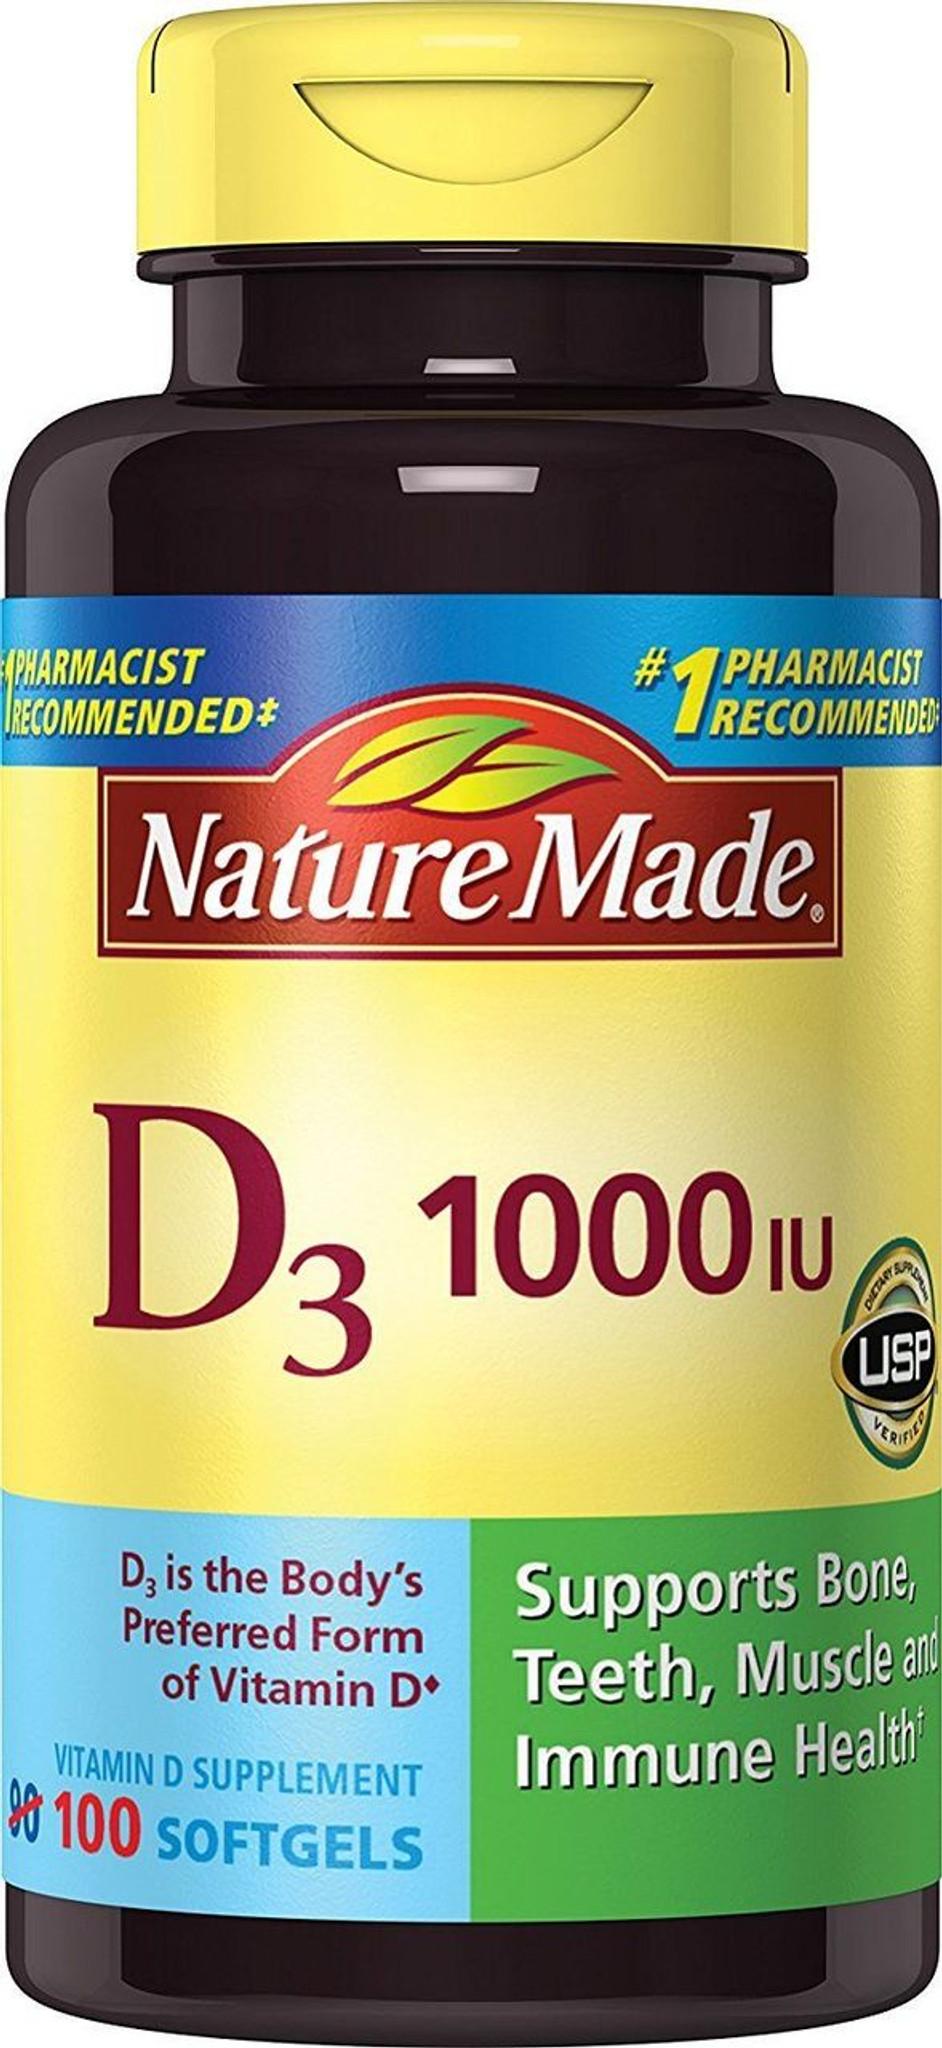 Nature Made Vitamin D3 1000 Iu Softgels 100 Ct Supports Bone Immune Health